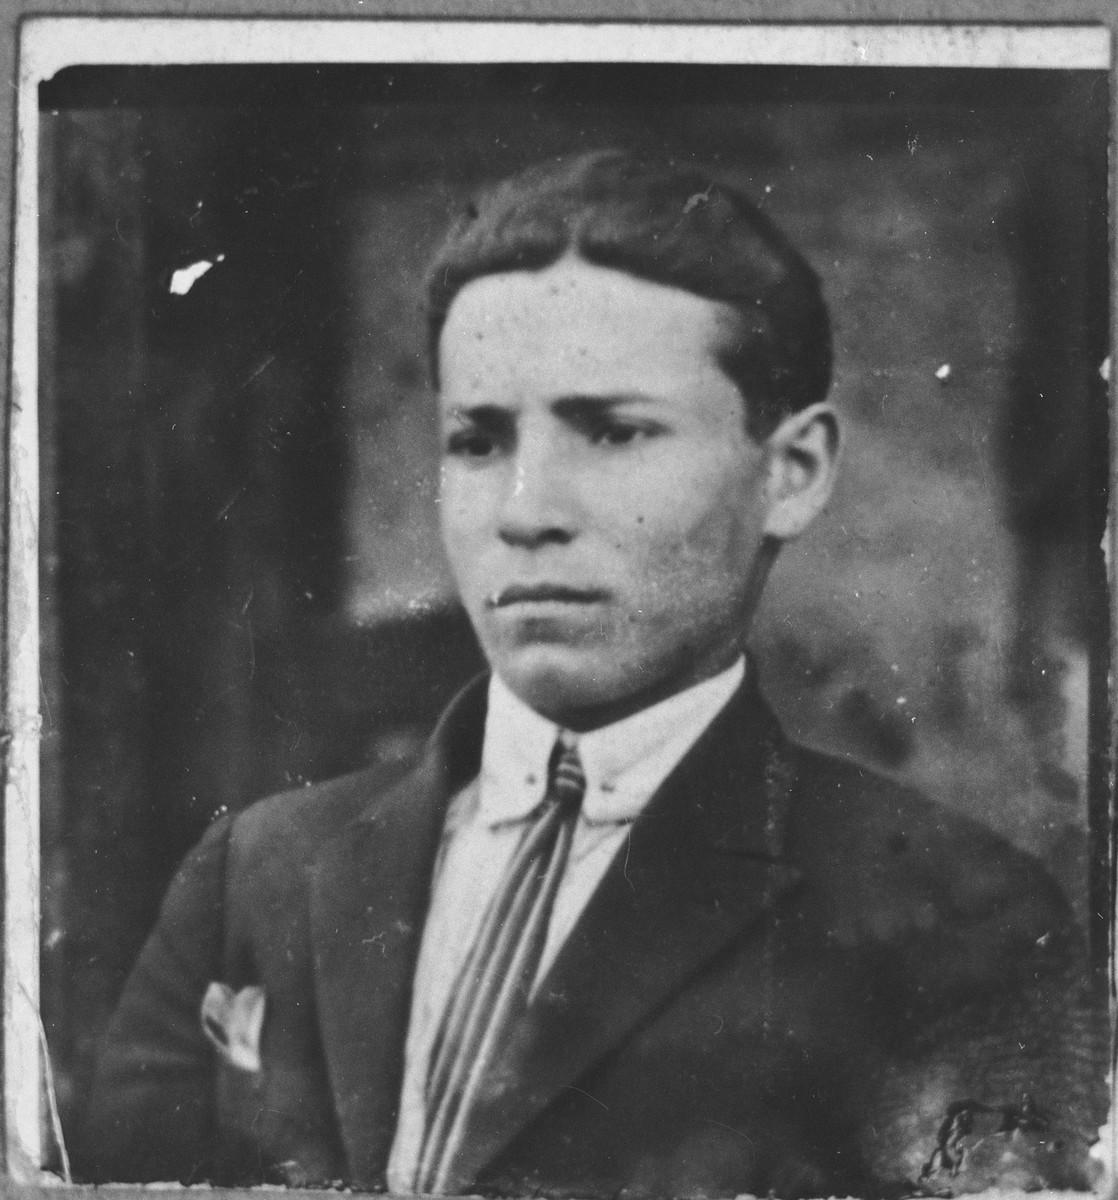 Portrait of Dario Koen.  He was a grocer.  He lived on Asadbegova in Bitola.